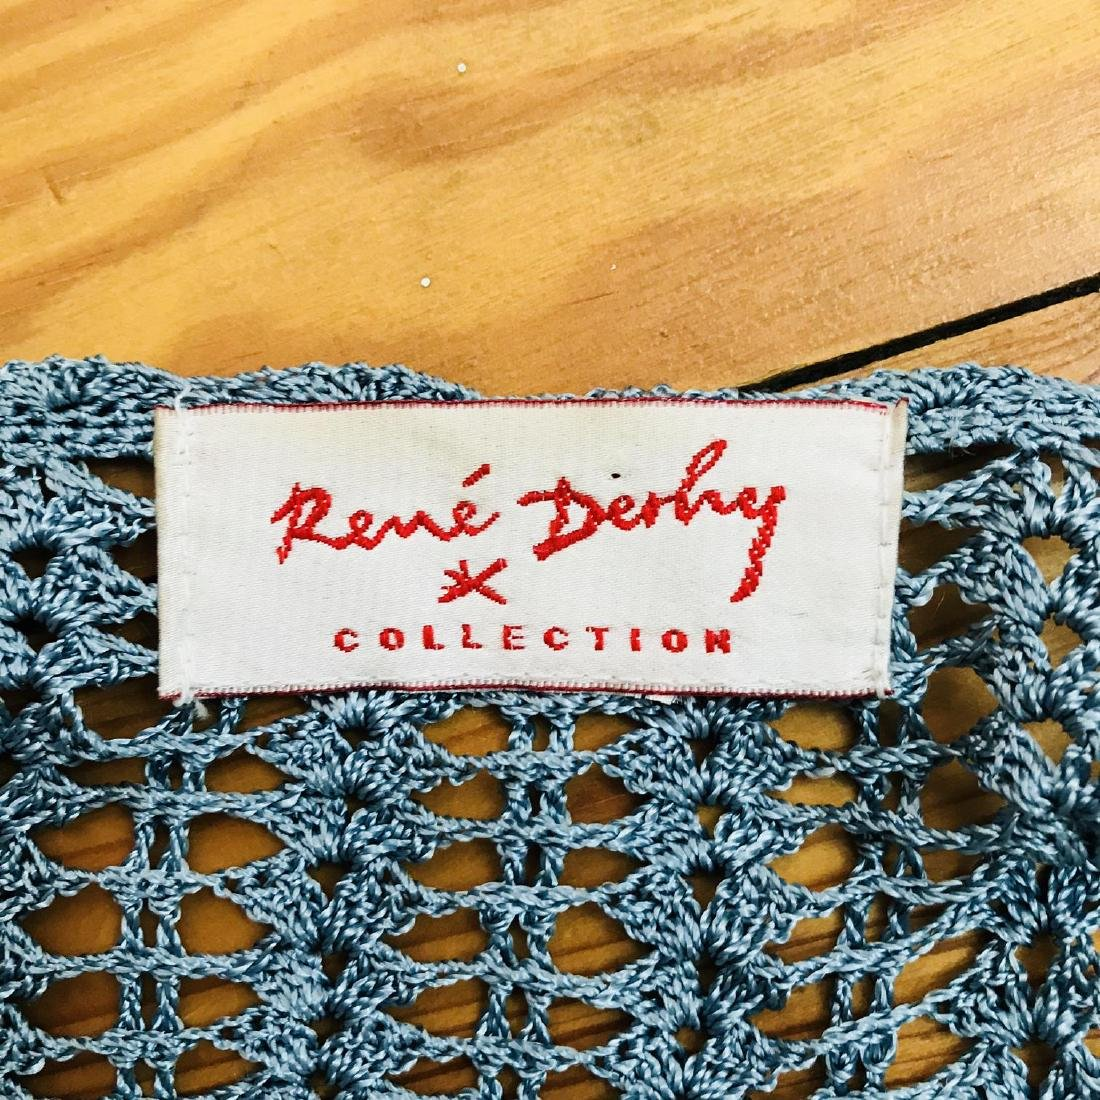 Vintage Women's Designer Sweater Cardigan Top Size US 6 - 6